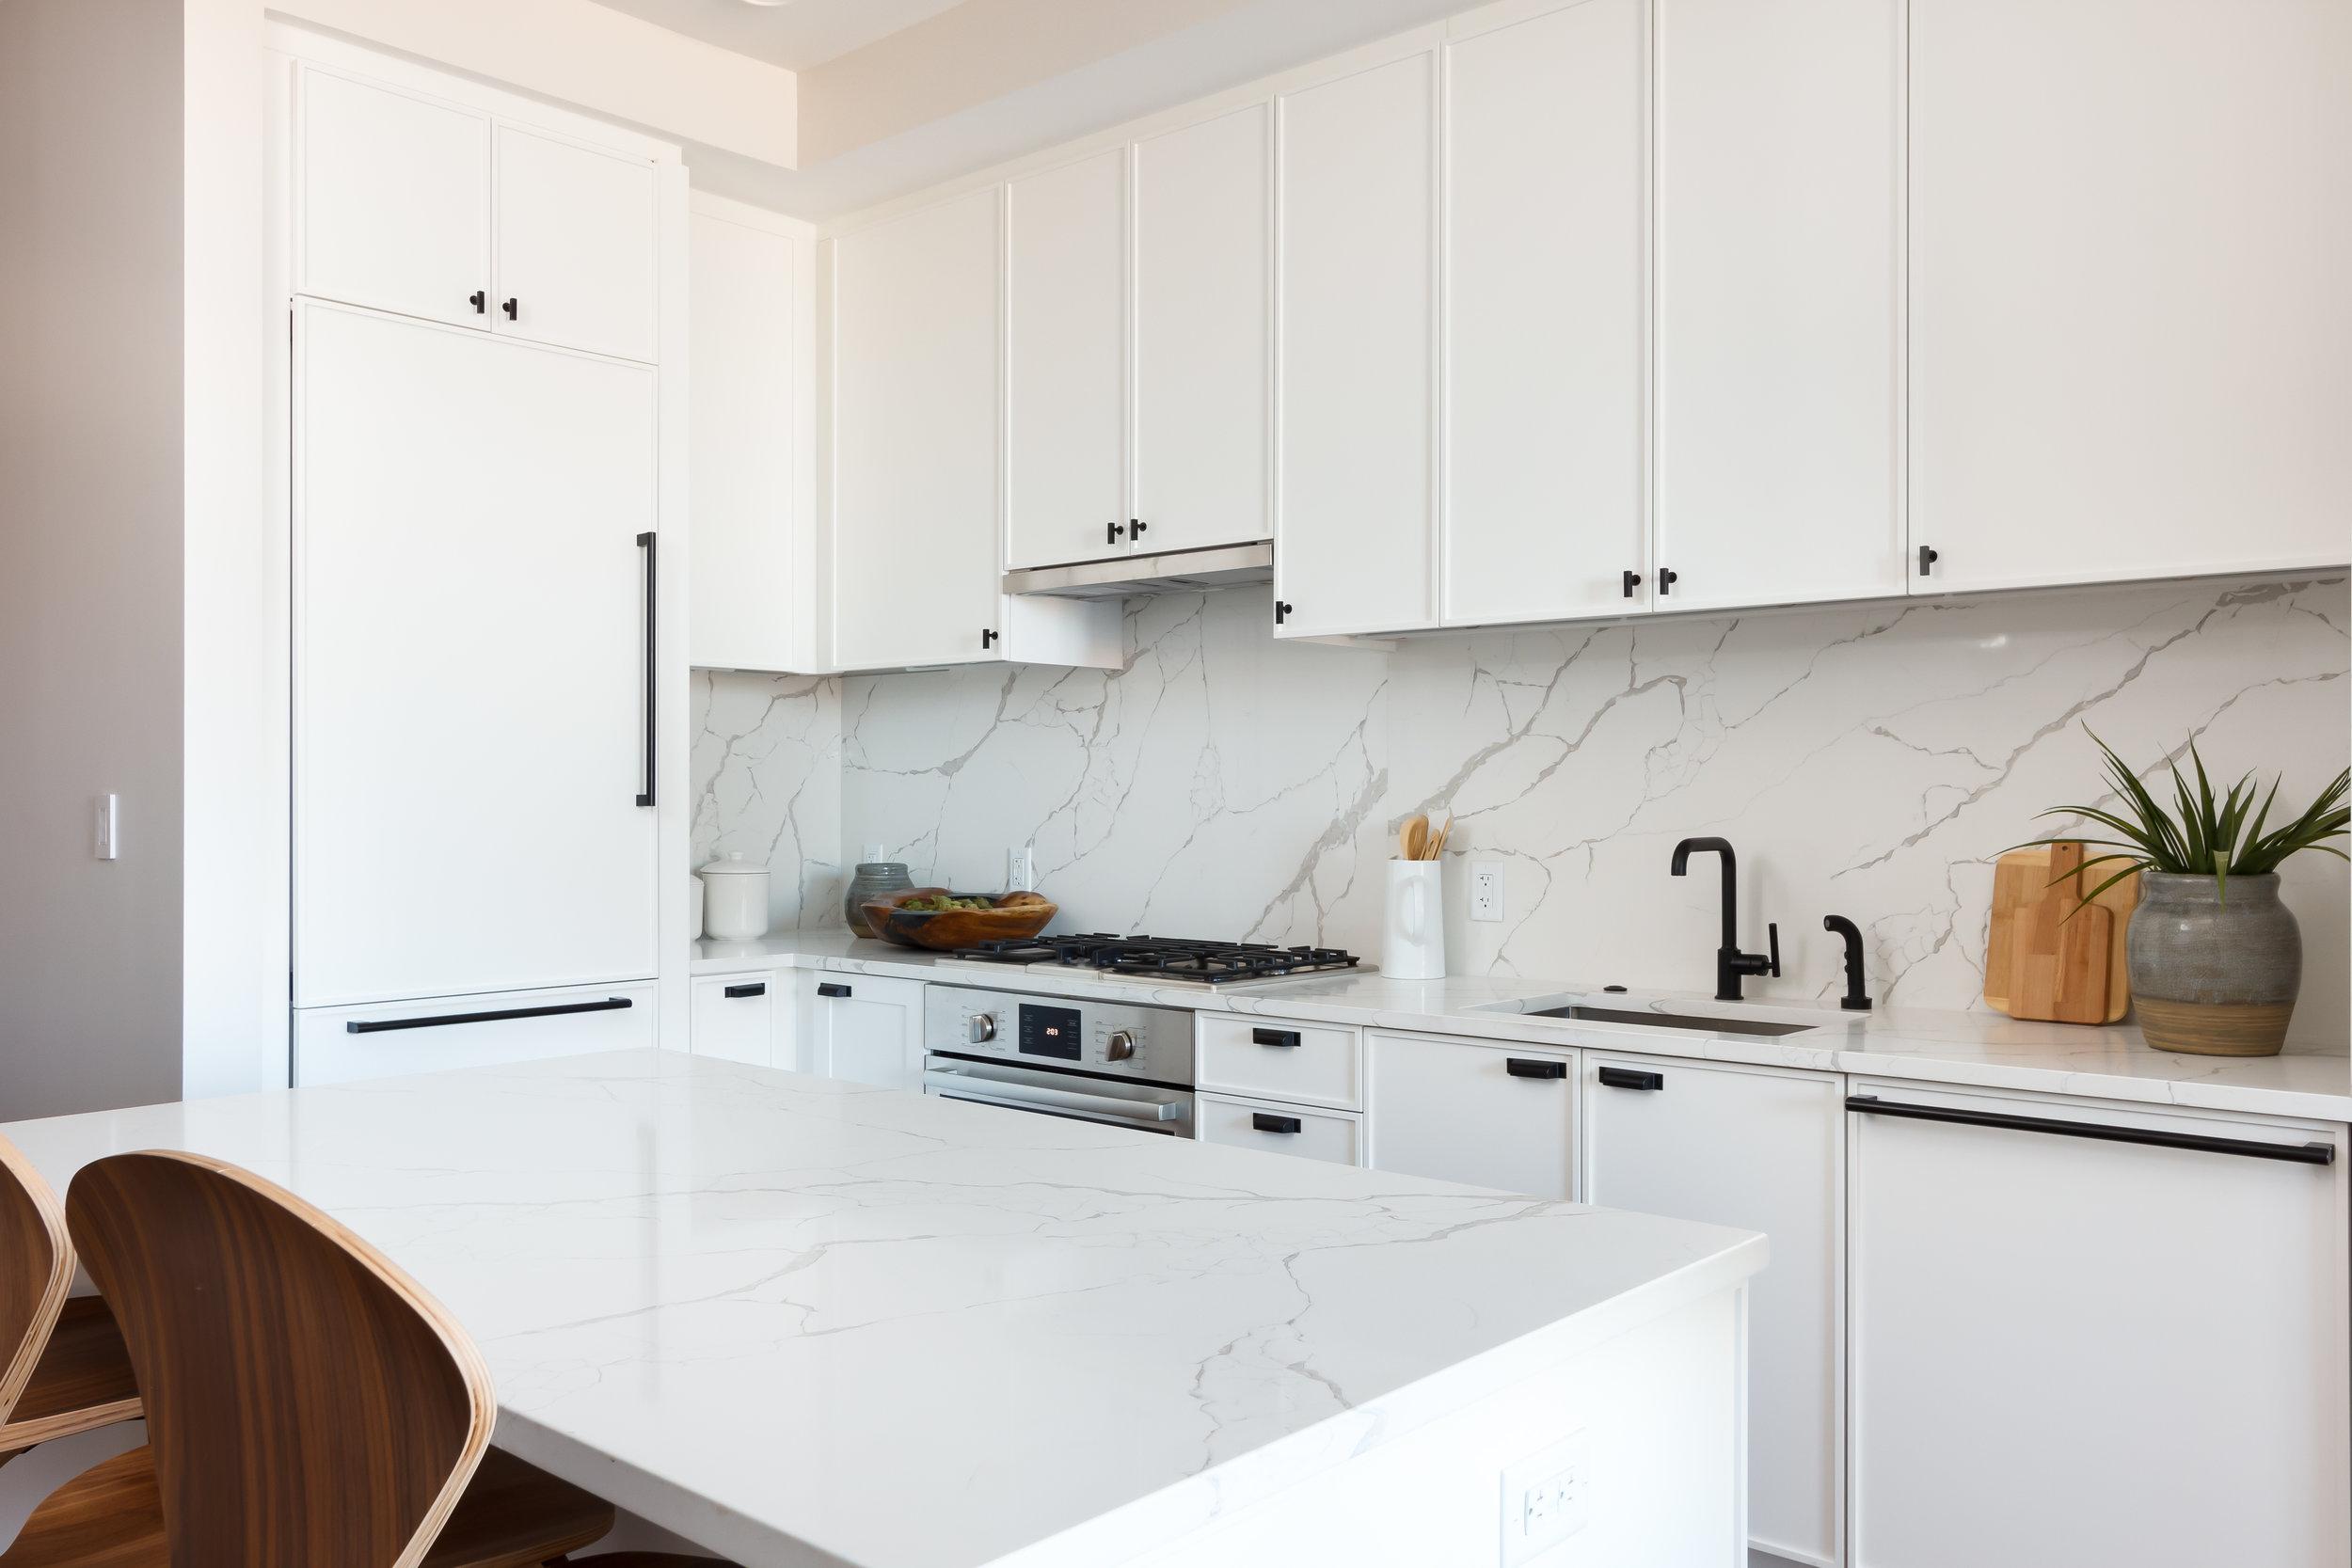 09 Unit 406 Kitchen 2018 (1).jpg